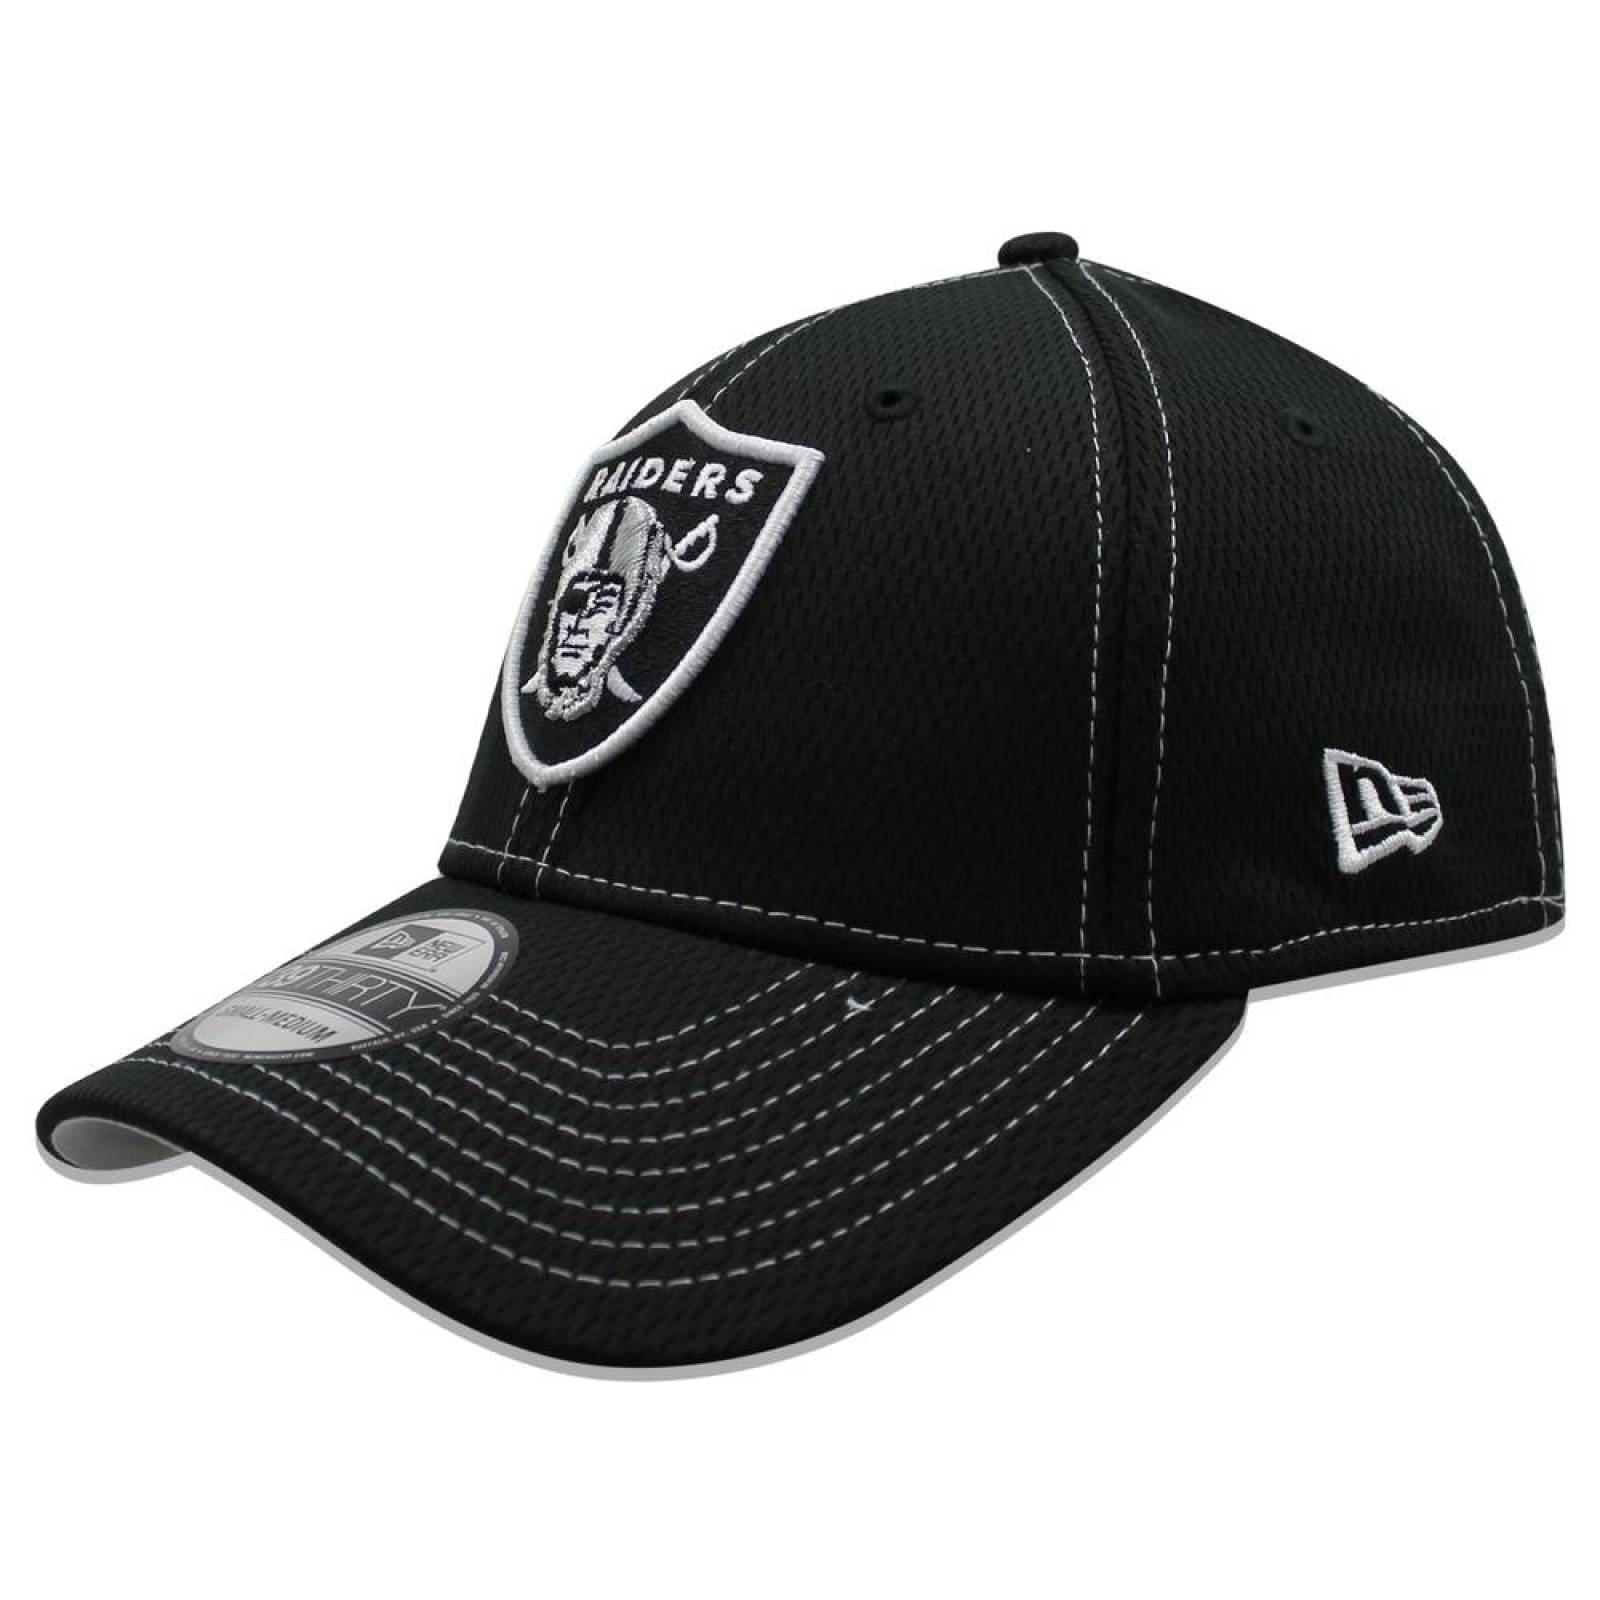 Gorra New Era 39 Thirty NFL Raiders Sideline Established Road Negro